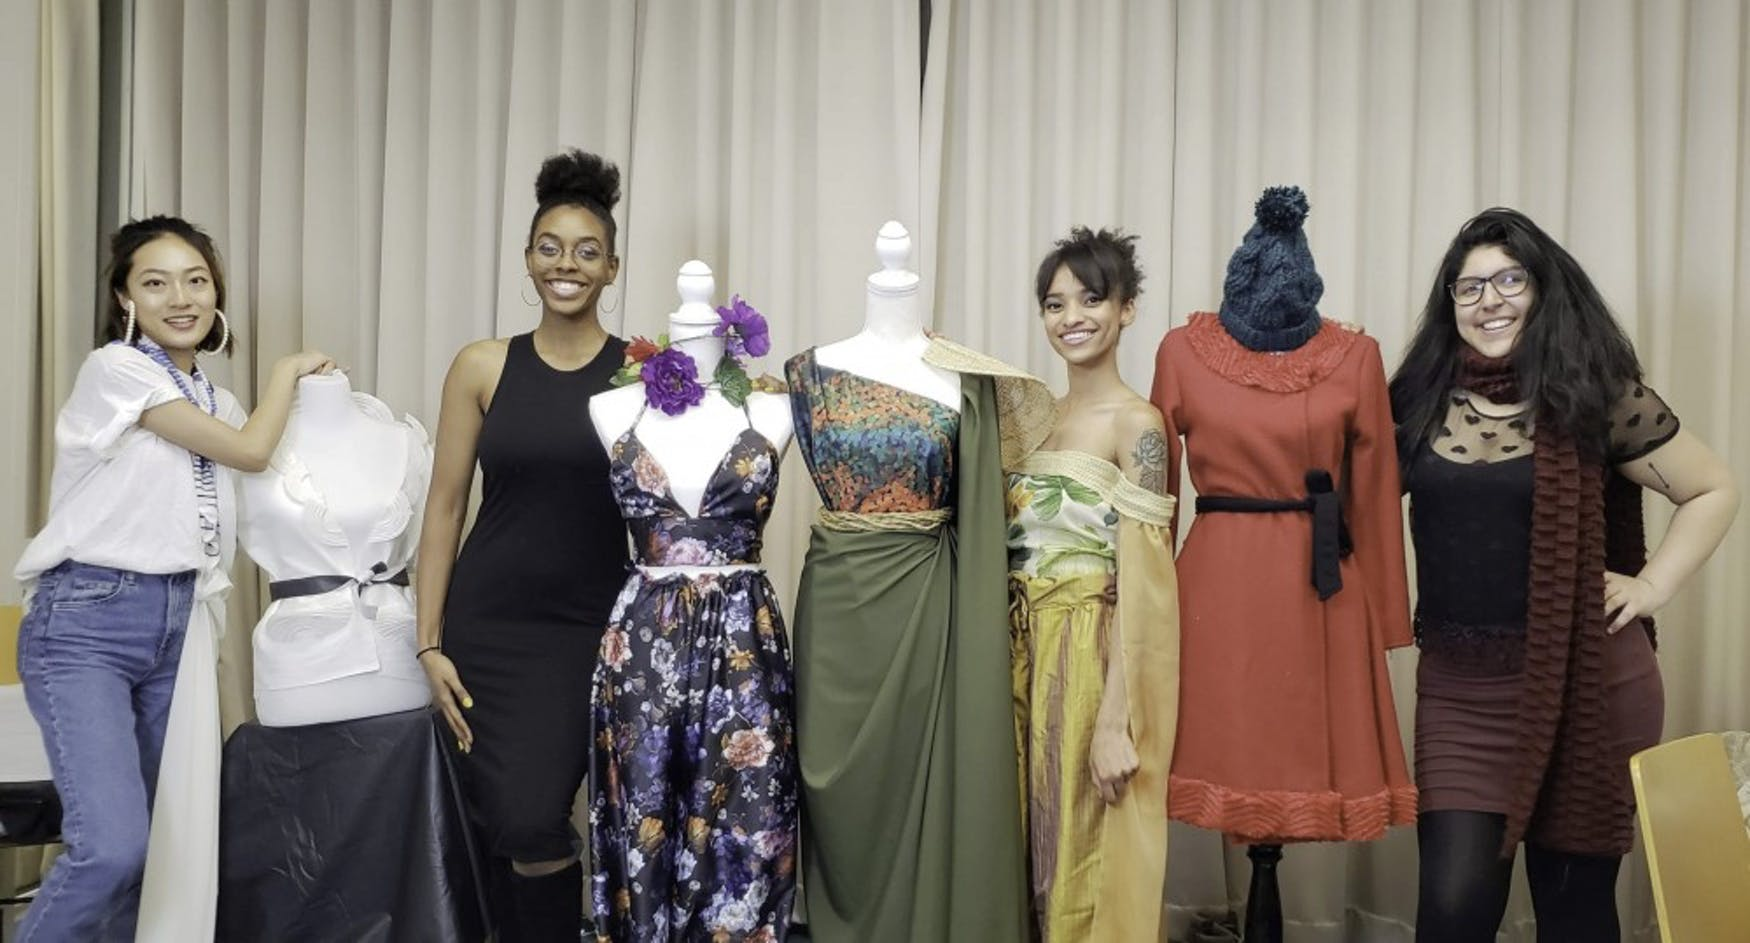 fashion-show-provided-by-organizer-1-copy